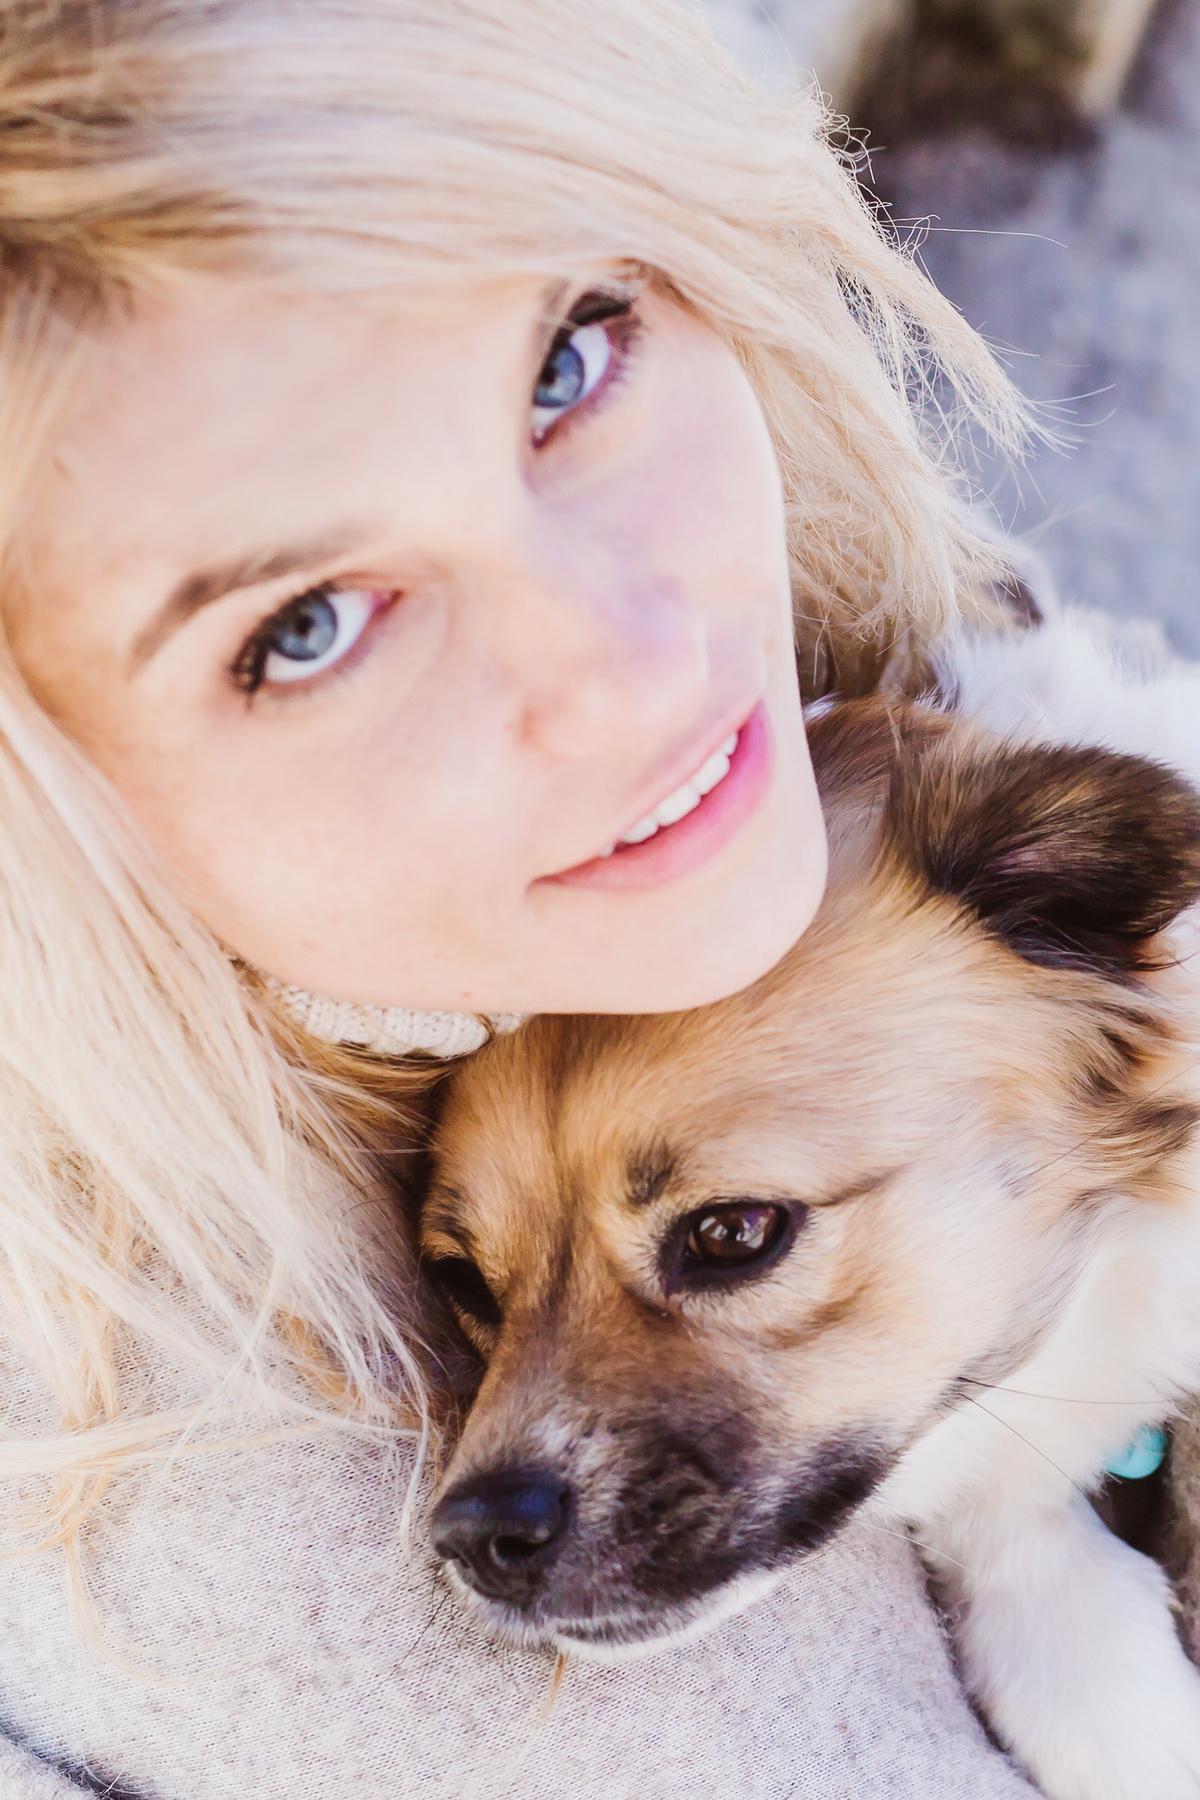 Loveshoot - Julia und Stefan - Claudia Sittig Photography - Lake Ammersee IMG_2515-2